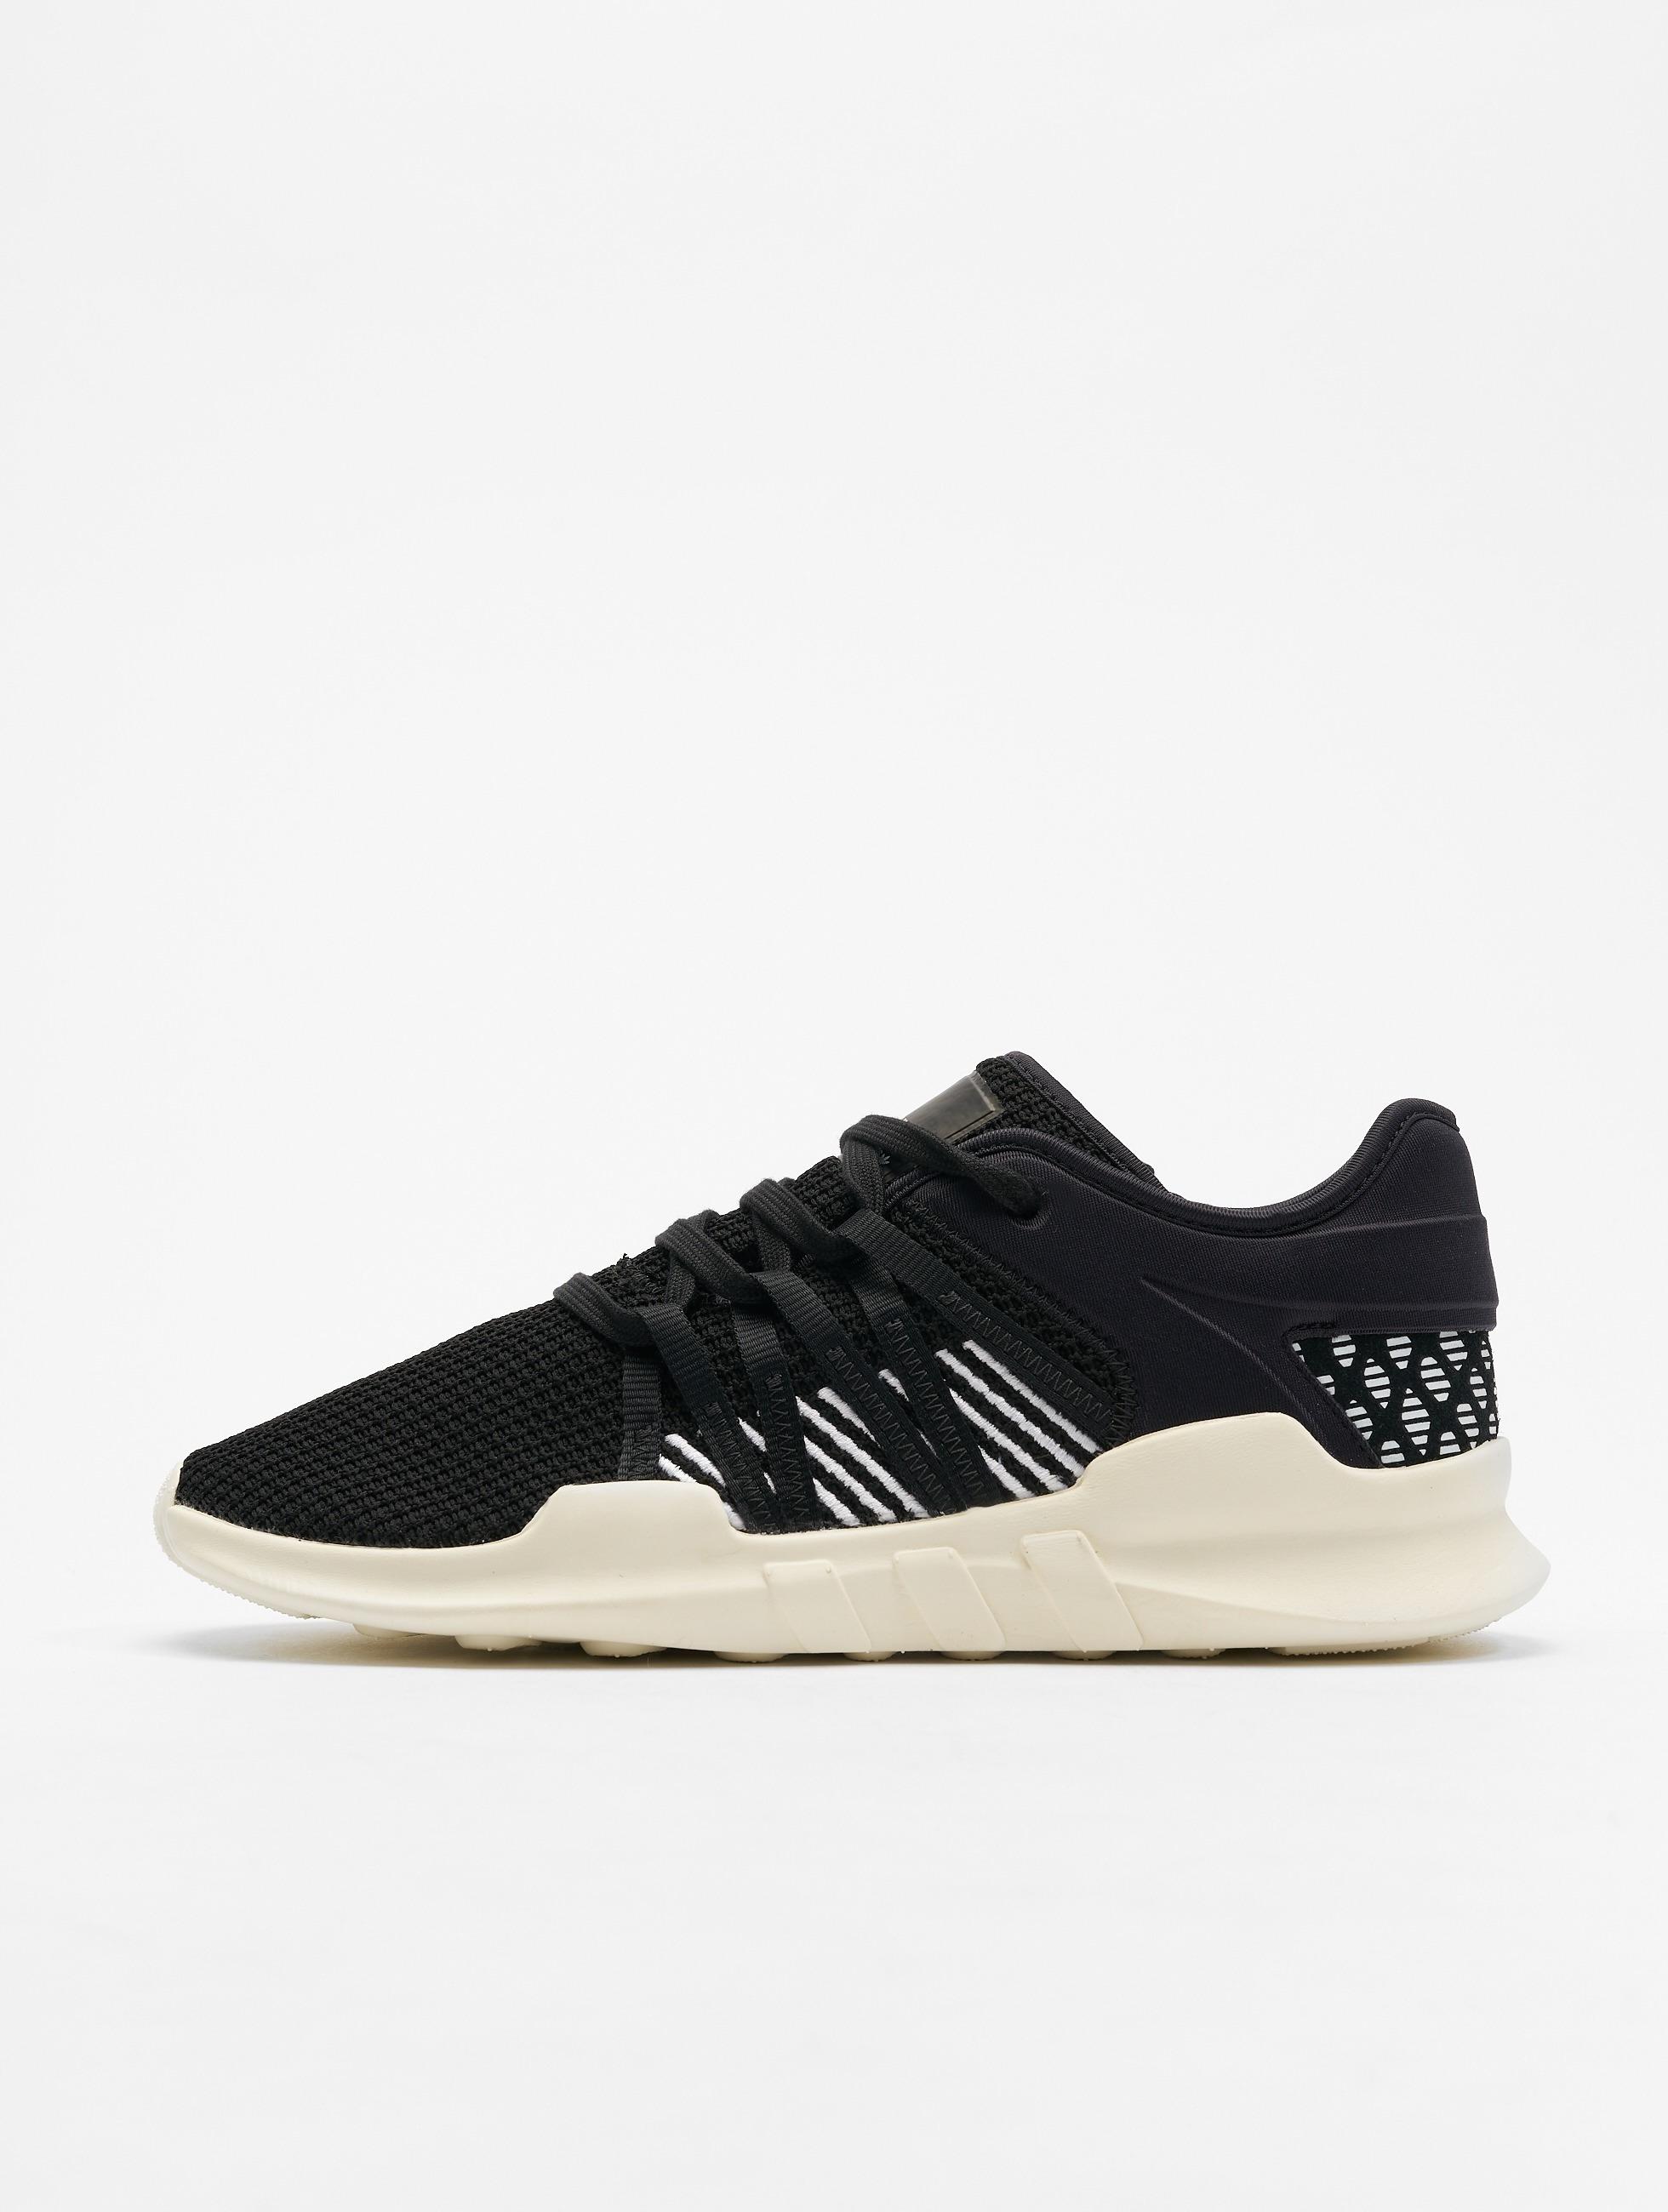 69ab2542e19 adidas originals schoen / sneaker EQT Racing ADV in zwart 360332